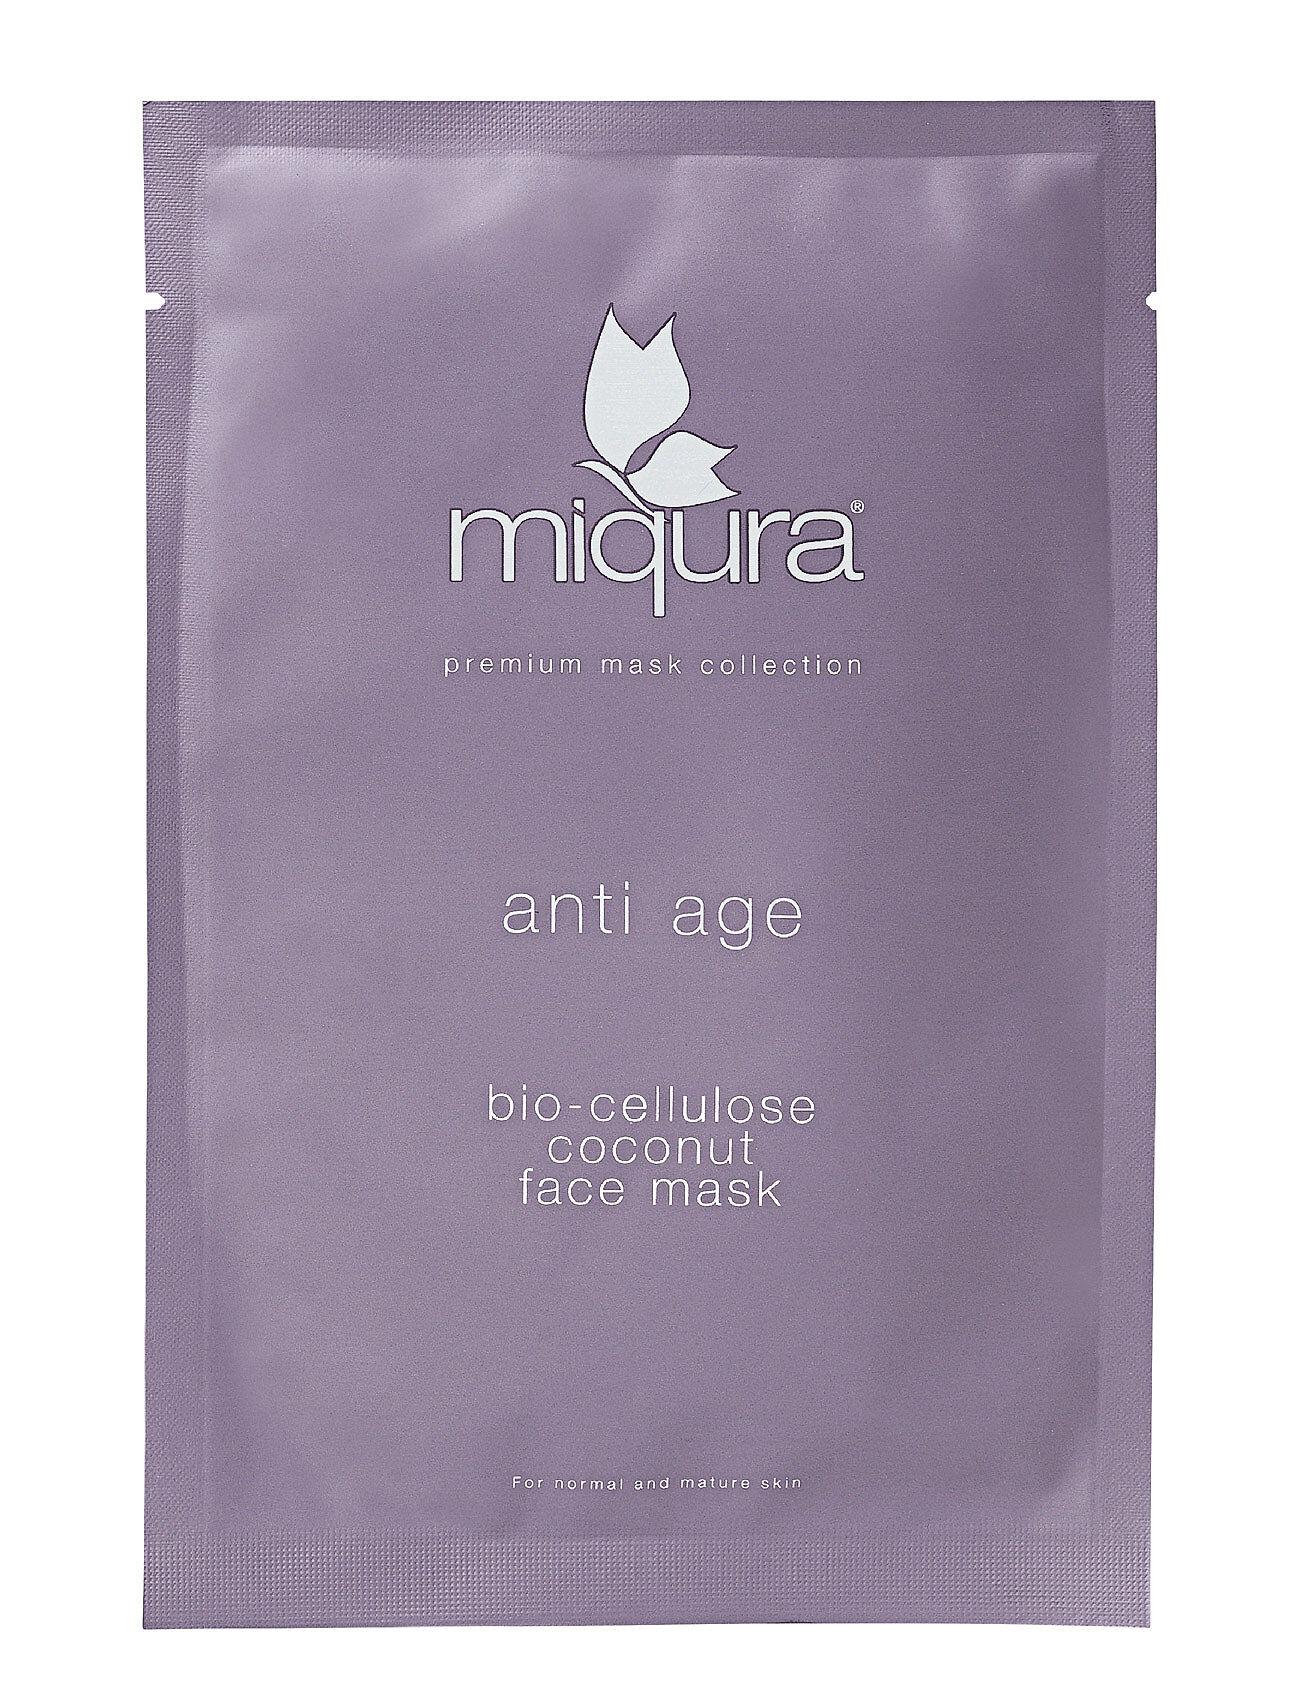 Miqura Anti Age Bio Cellulose Sheet Mask Beauty WOMEN Skin Care Face Sheet Mask Nude Miqura